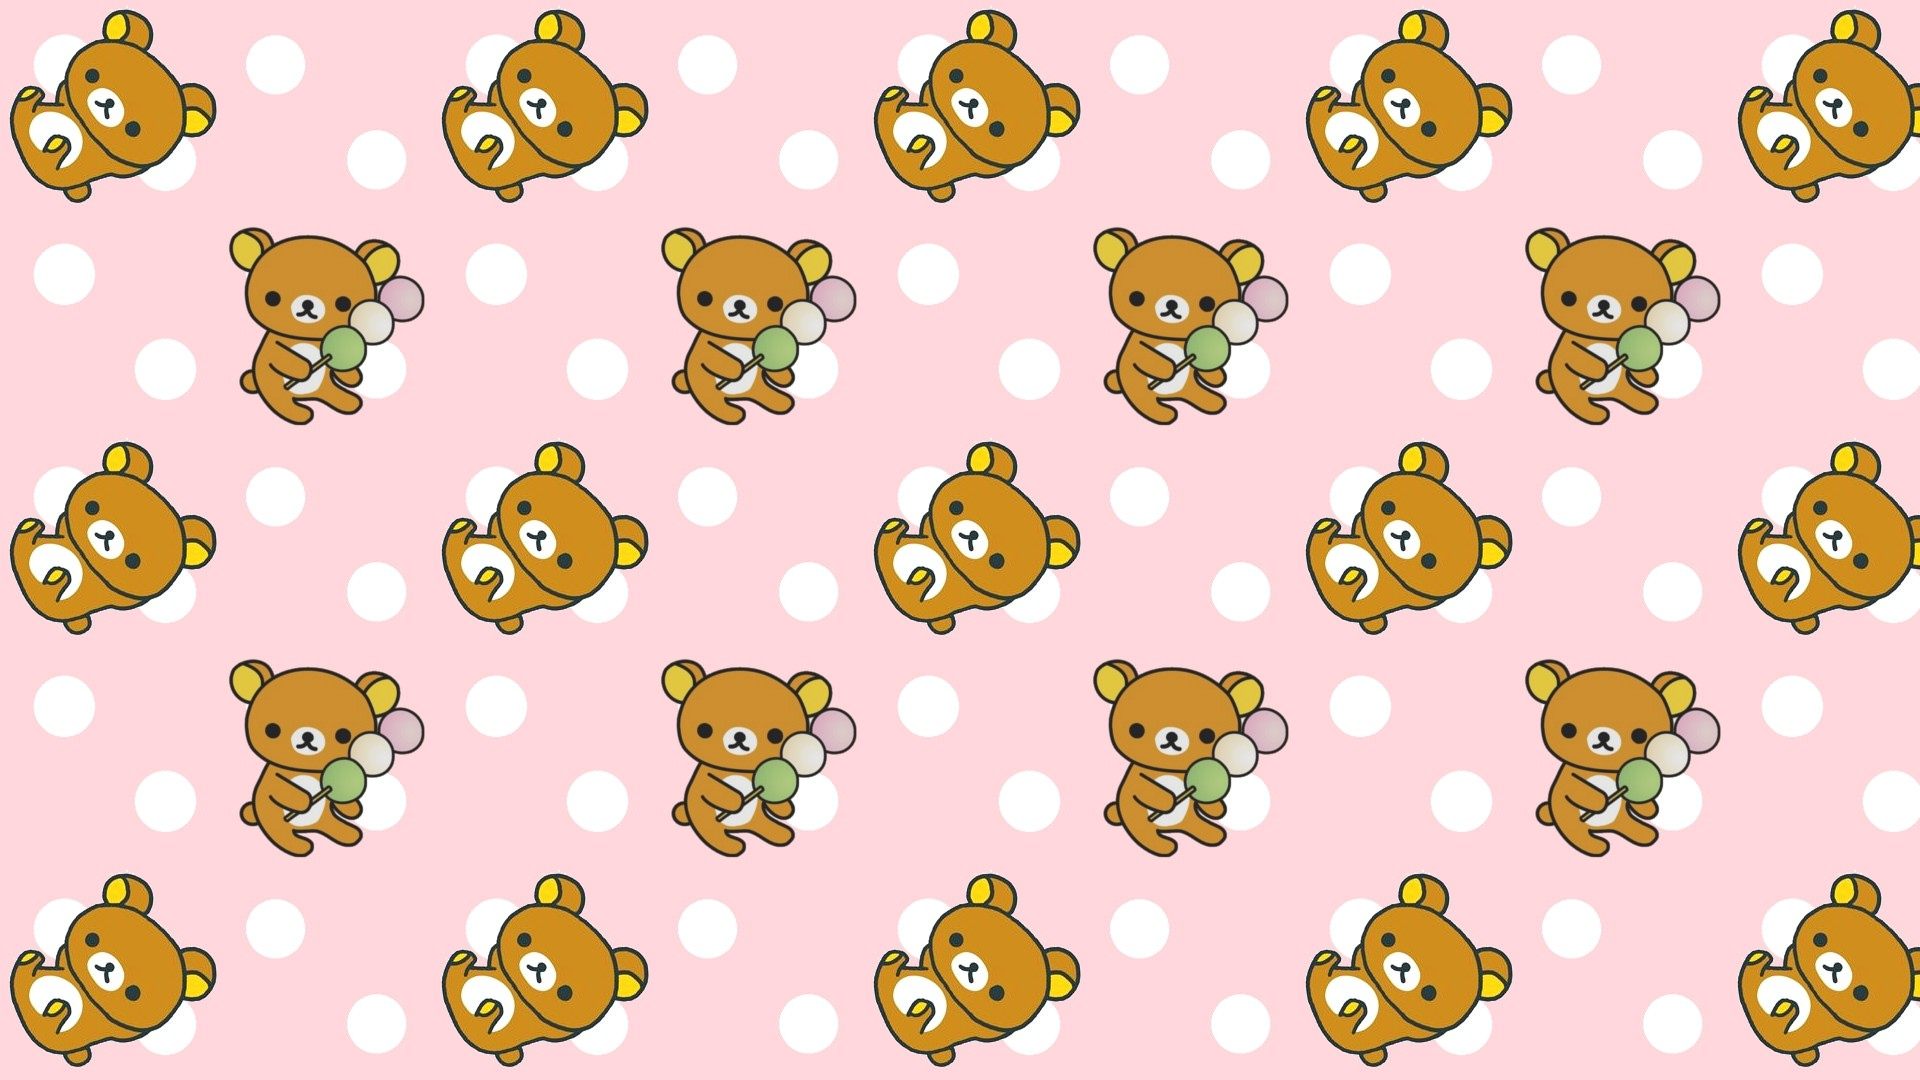 82 Cute Kawaii Wallpaper For Iphone